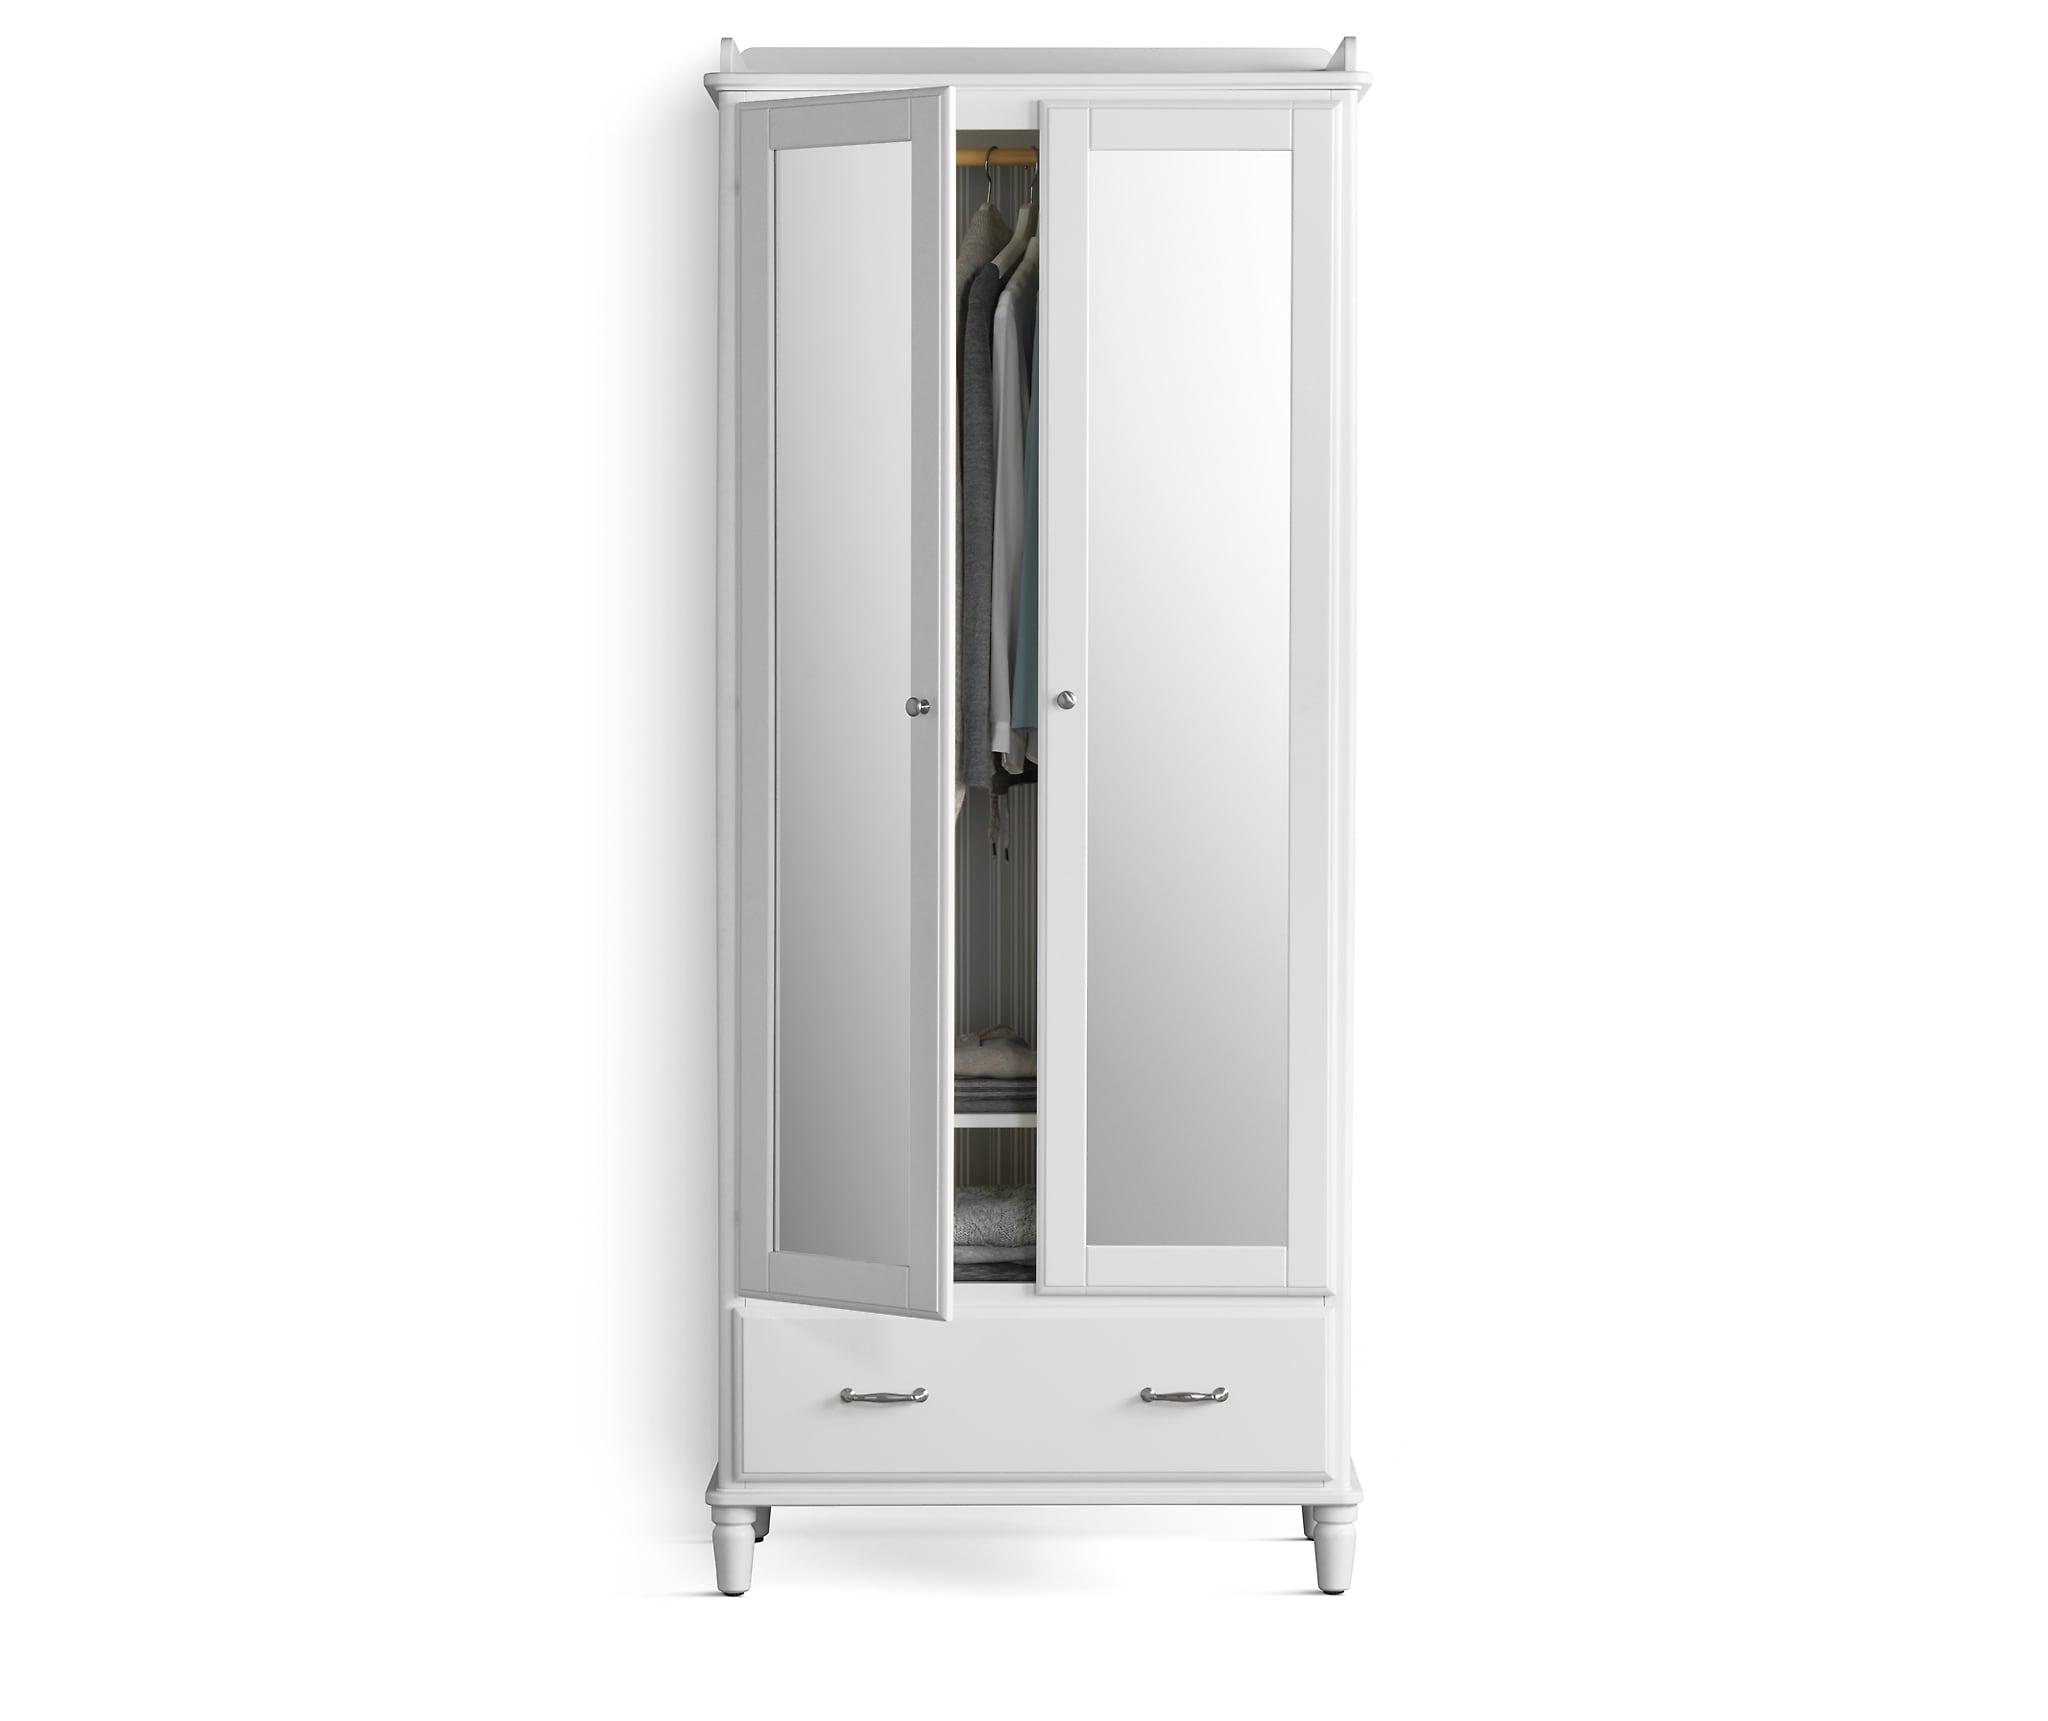 Armarios Online Irdz Armarios Indepen Ntes Para Ropa Pra Online Ikea